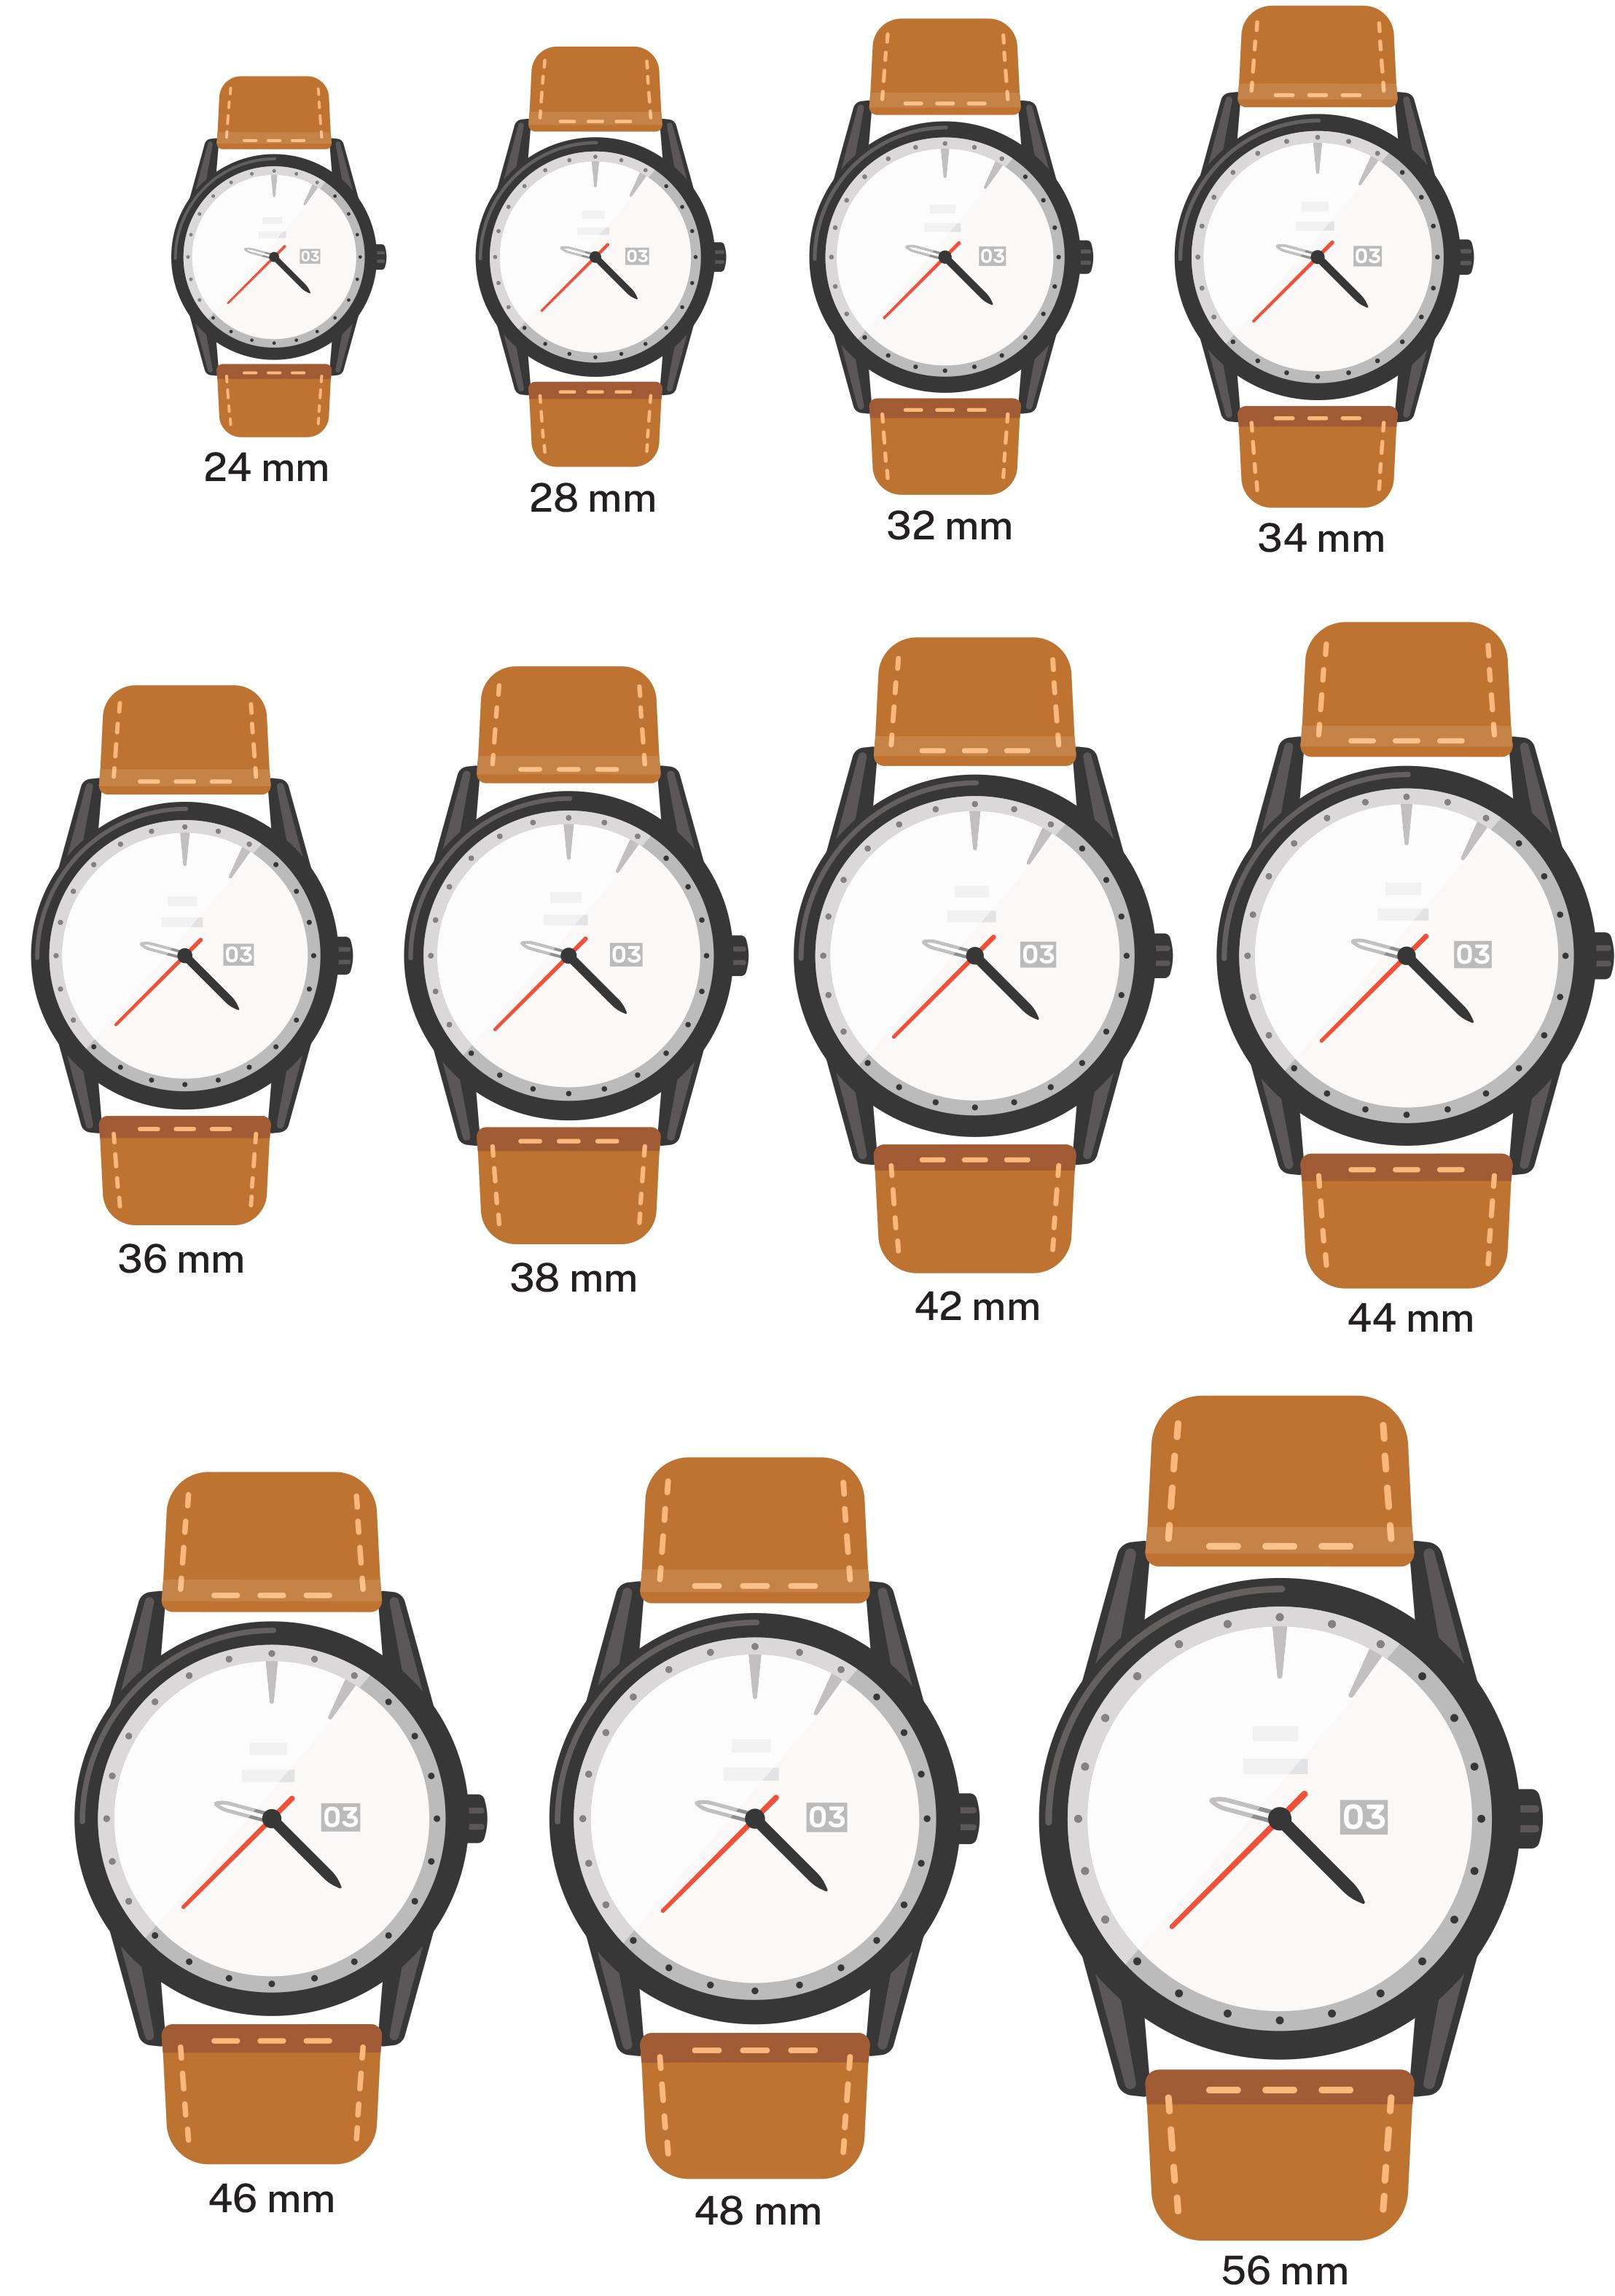 tabulka-velikosti-hodinek-helvetia1